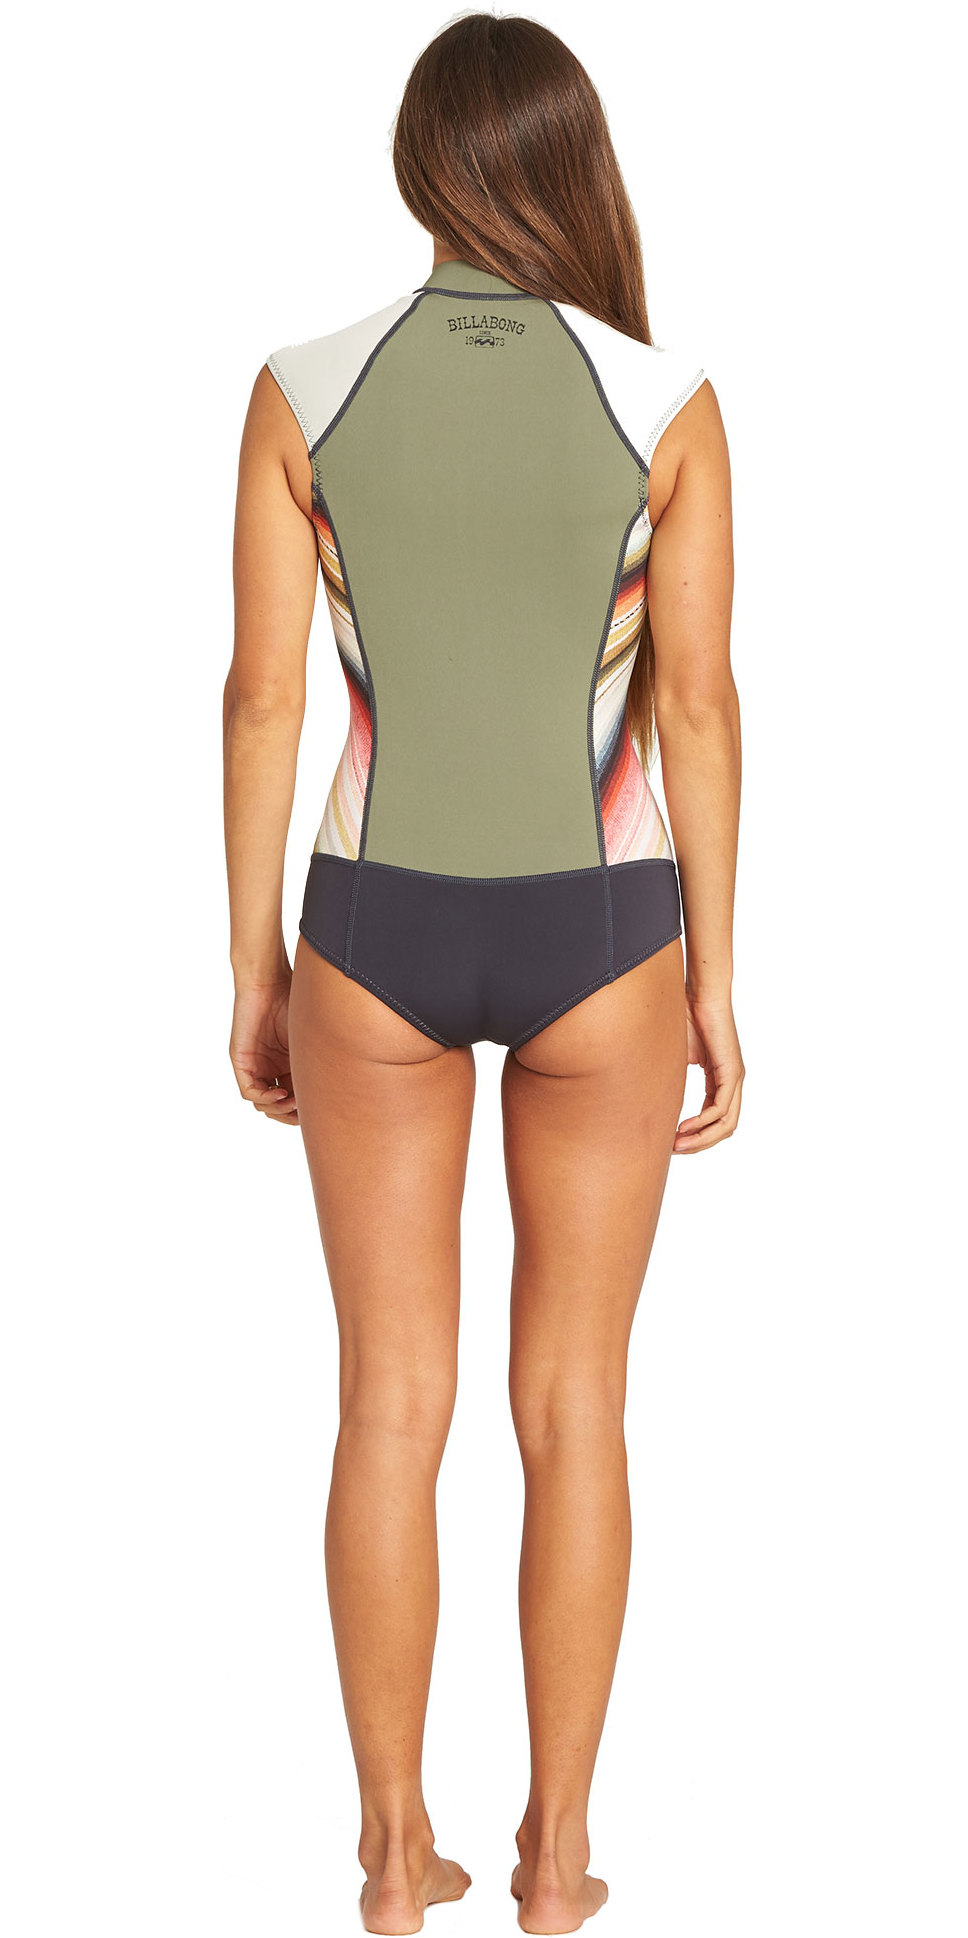 2019 Billabong Femmes 1mm Capitaine Spring Shorty Sans Manches Spring Shorty Wetsuit Combinaison Serape N41g05